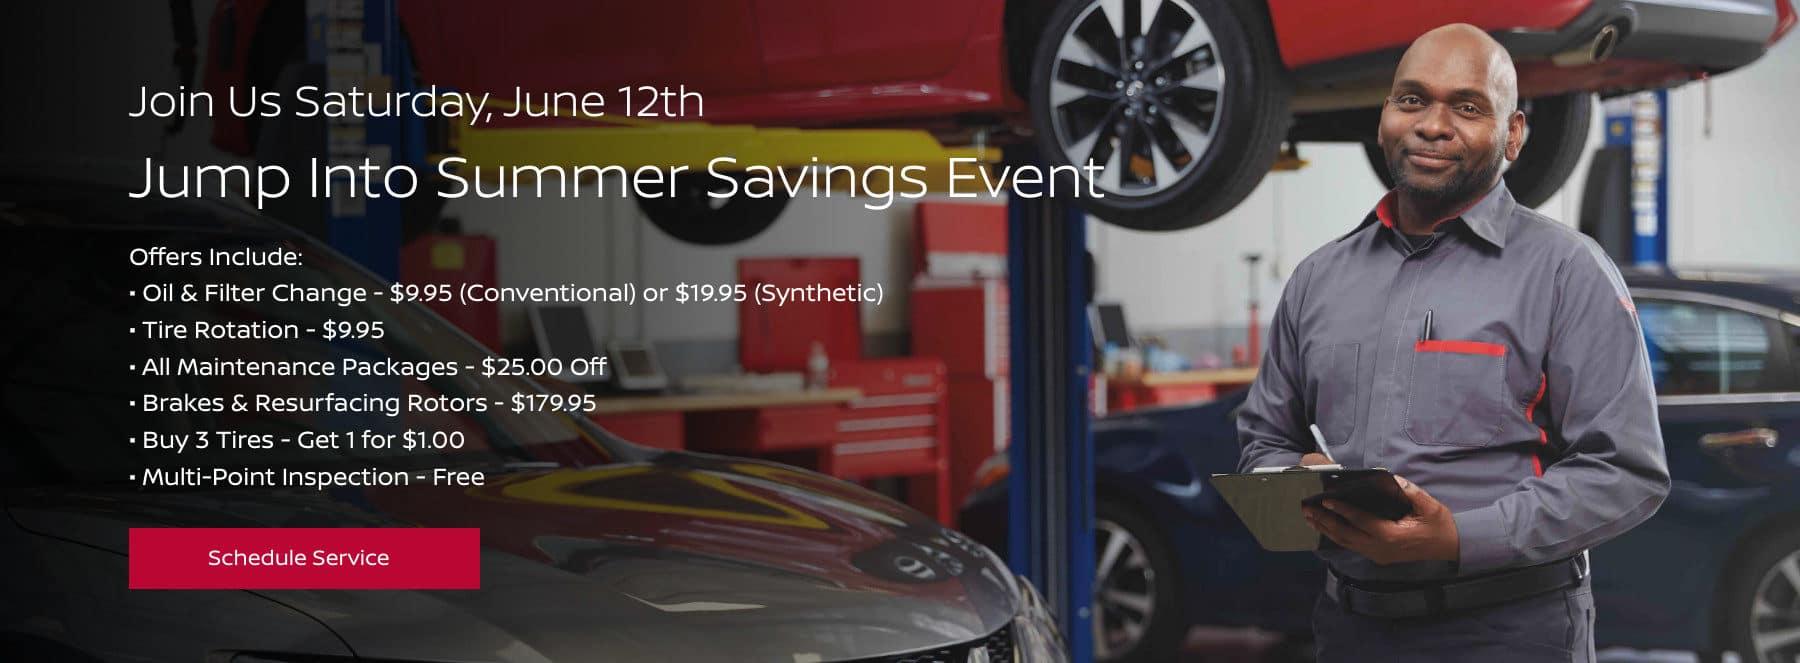 Summer Savings Event - June 12th